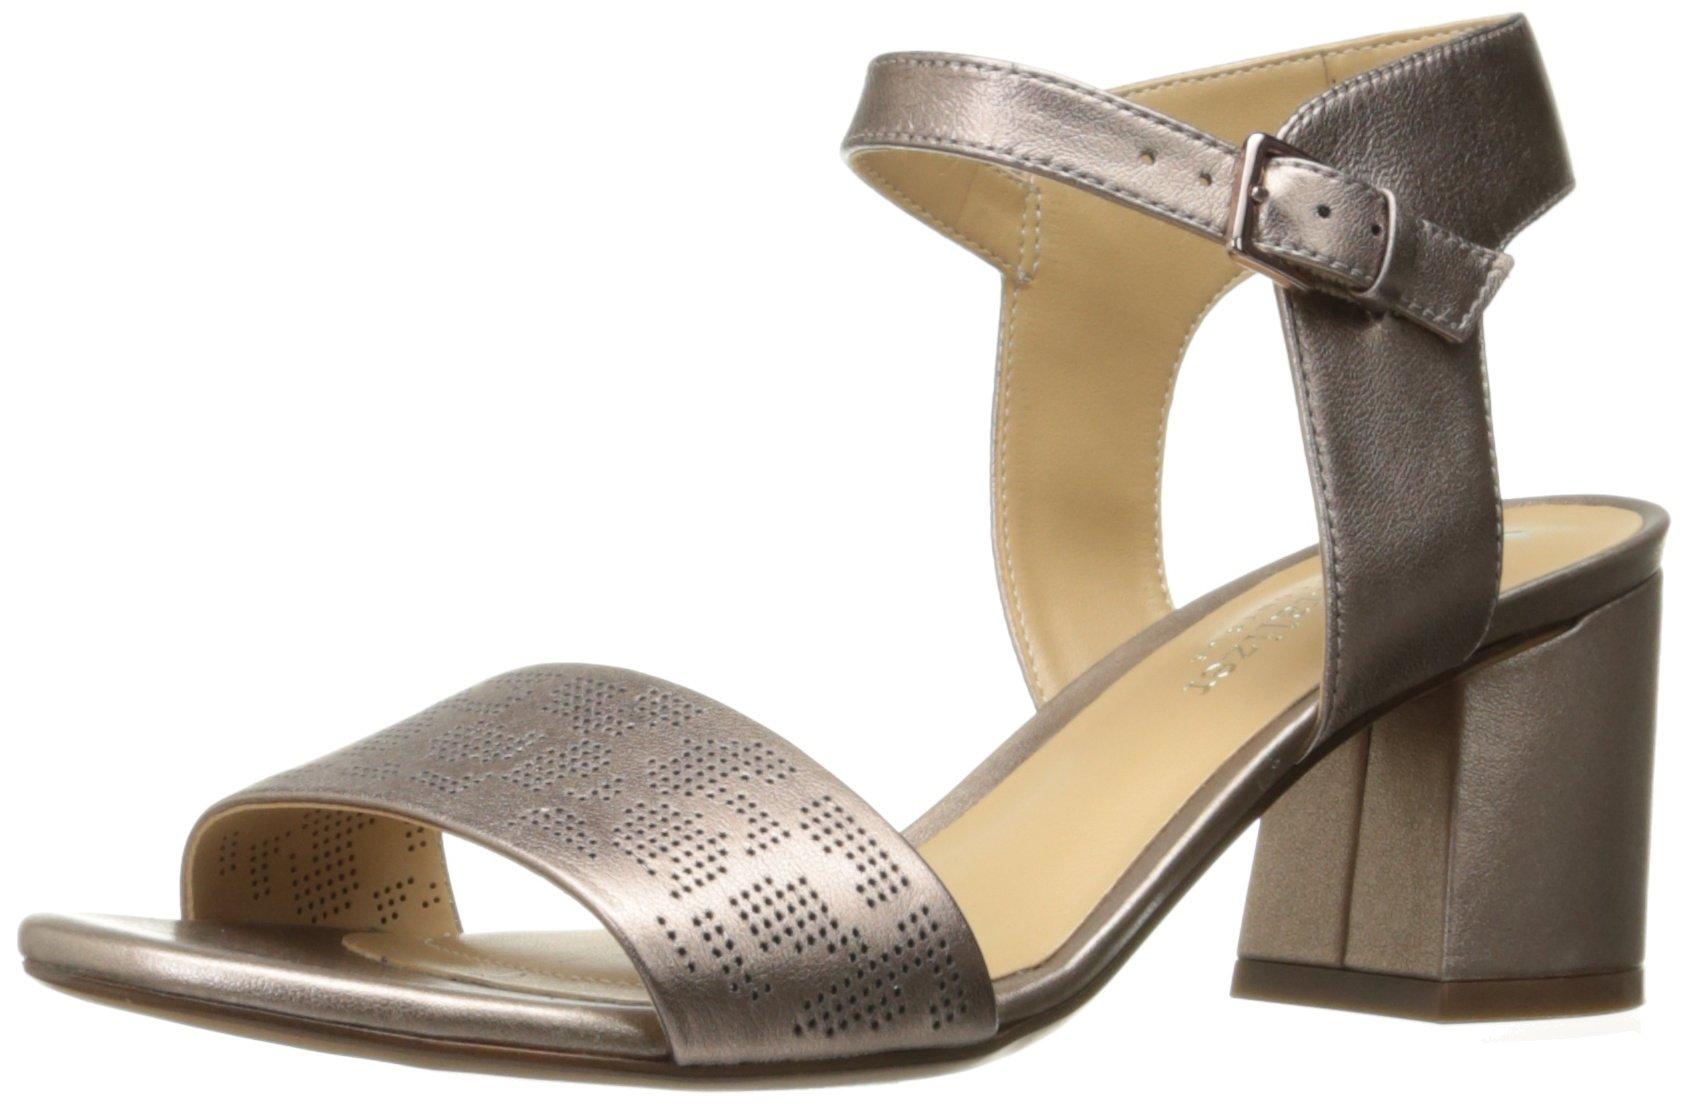 Naturalizer Women's Caitlyn Dress Sandal, Bronze, 5.5 M US